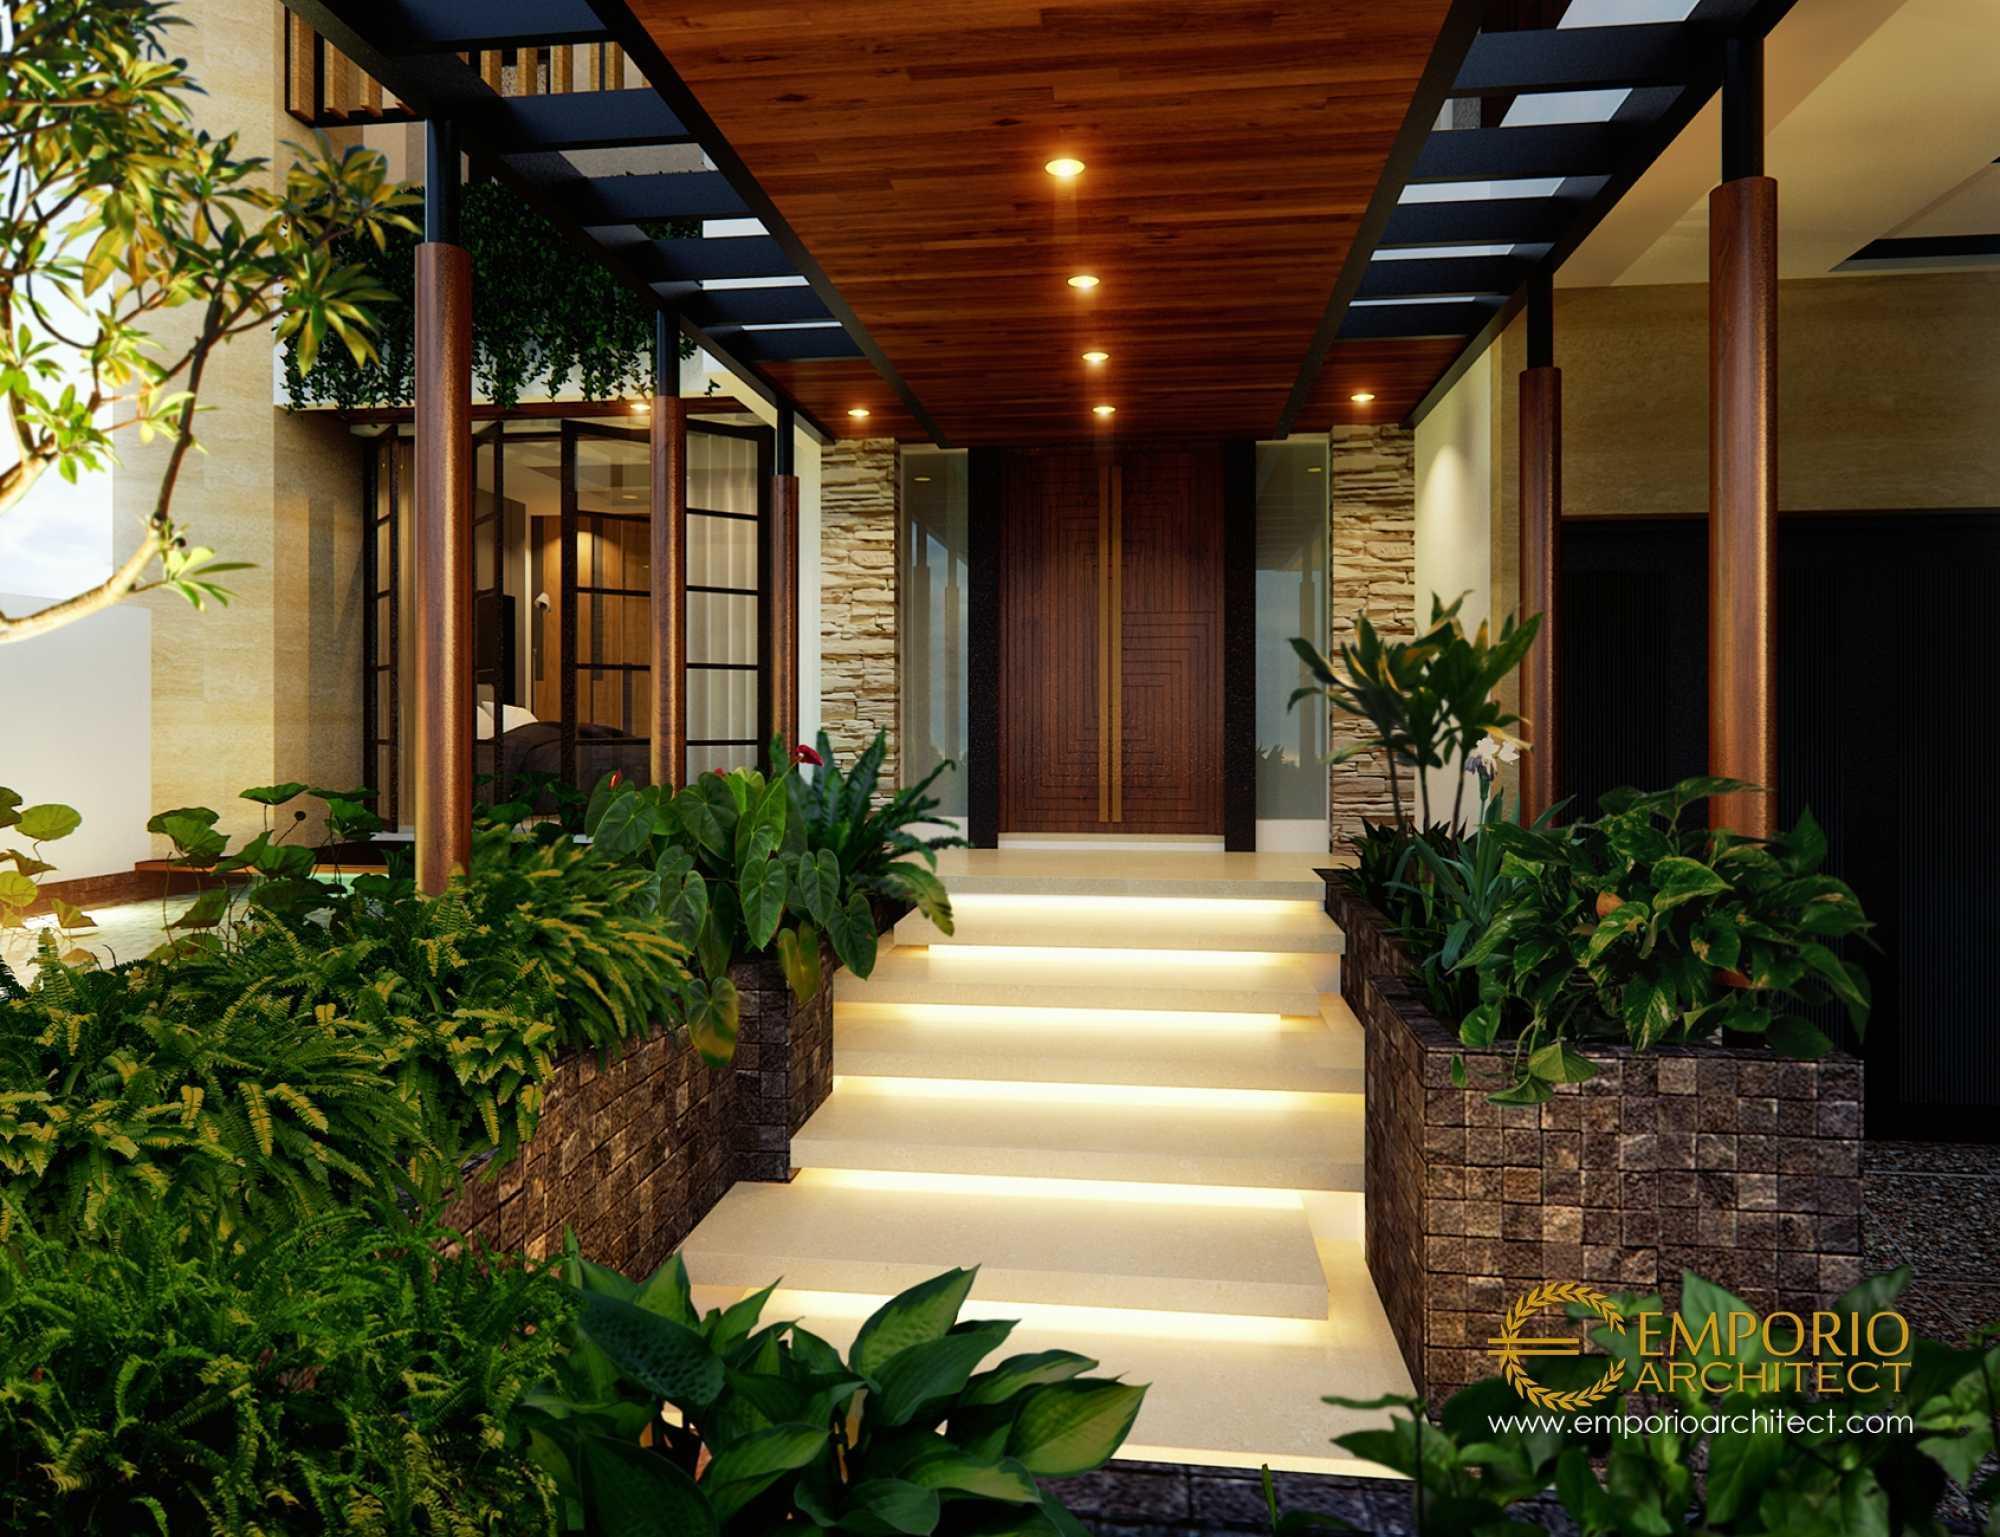 Emporio Architect Desain Rumah Modern Tropis 373 @ Bandung Bandung, Kota Bandung, Jawa Barat, Indonesia Bandung, Kota Bandung, Jawa Barat, Indonesia Emporio-Architect-Desain-Rumah-Modern-Tropis-373-Bandung Modern 73748